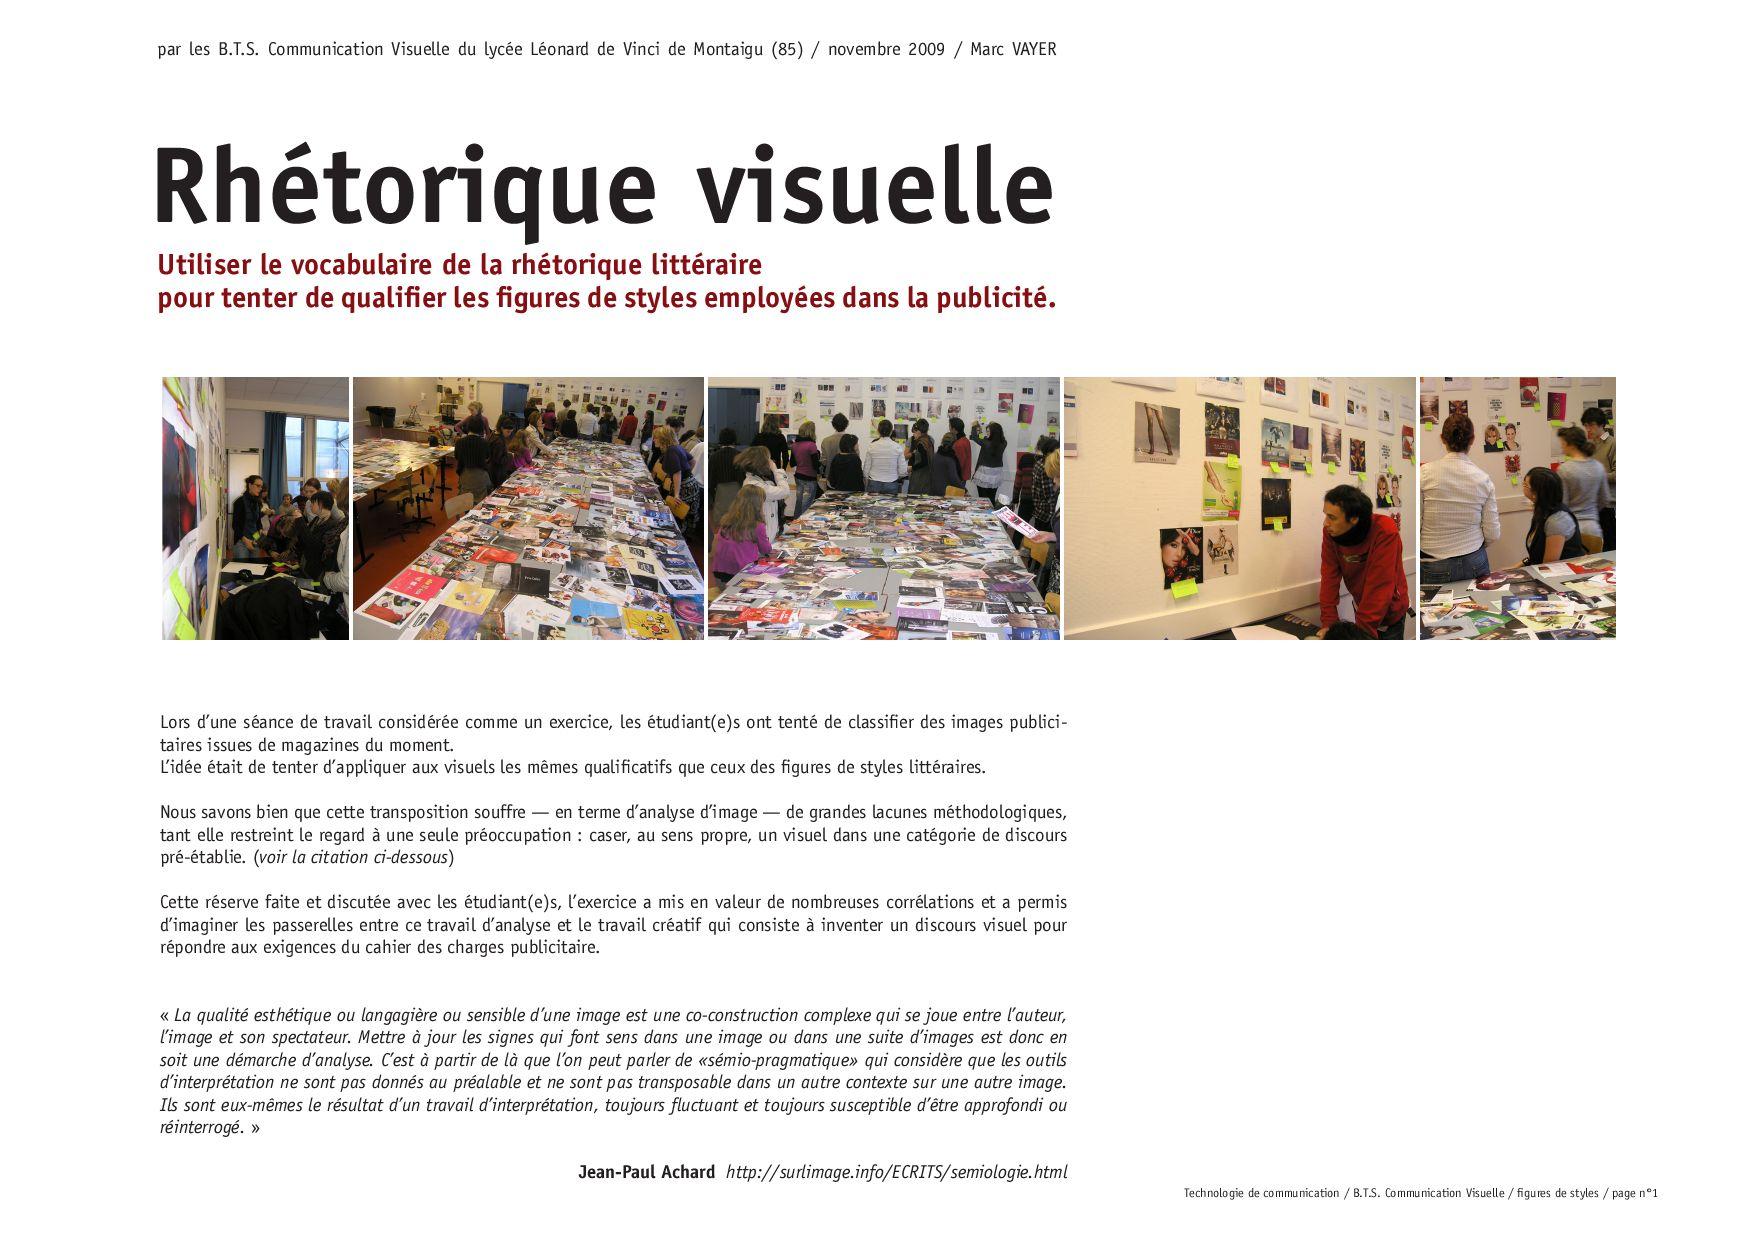 images et figures de style by VAYER Marc - Issuu